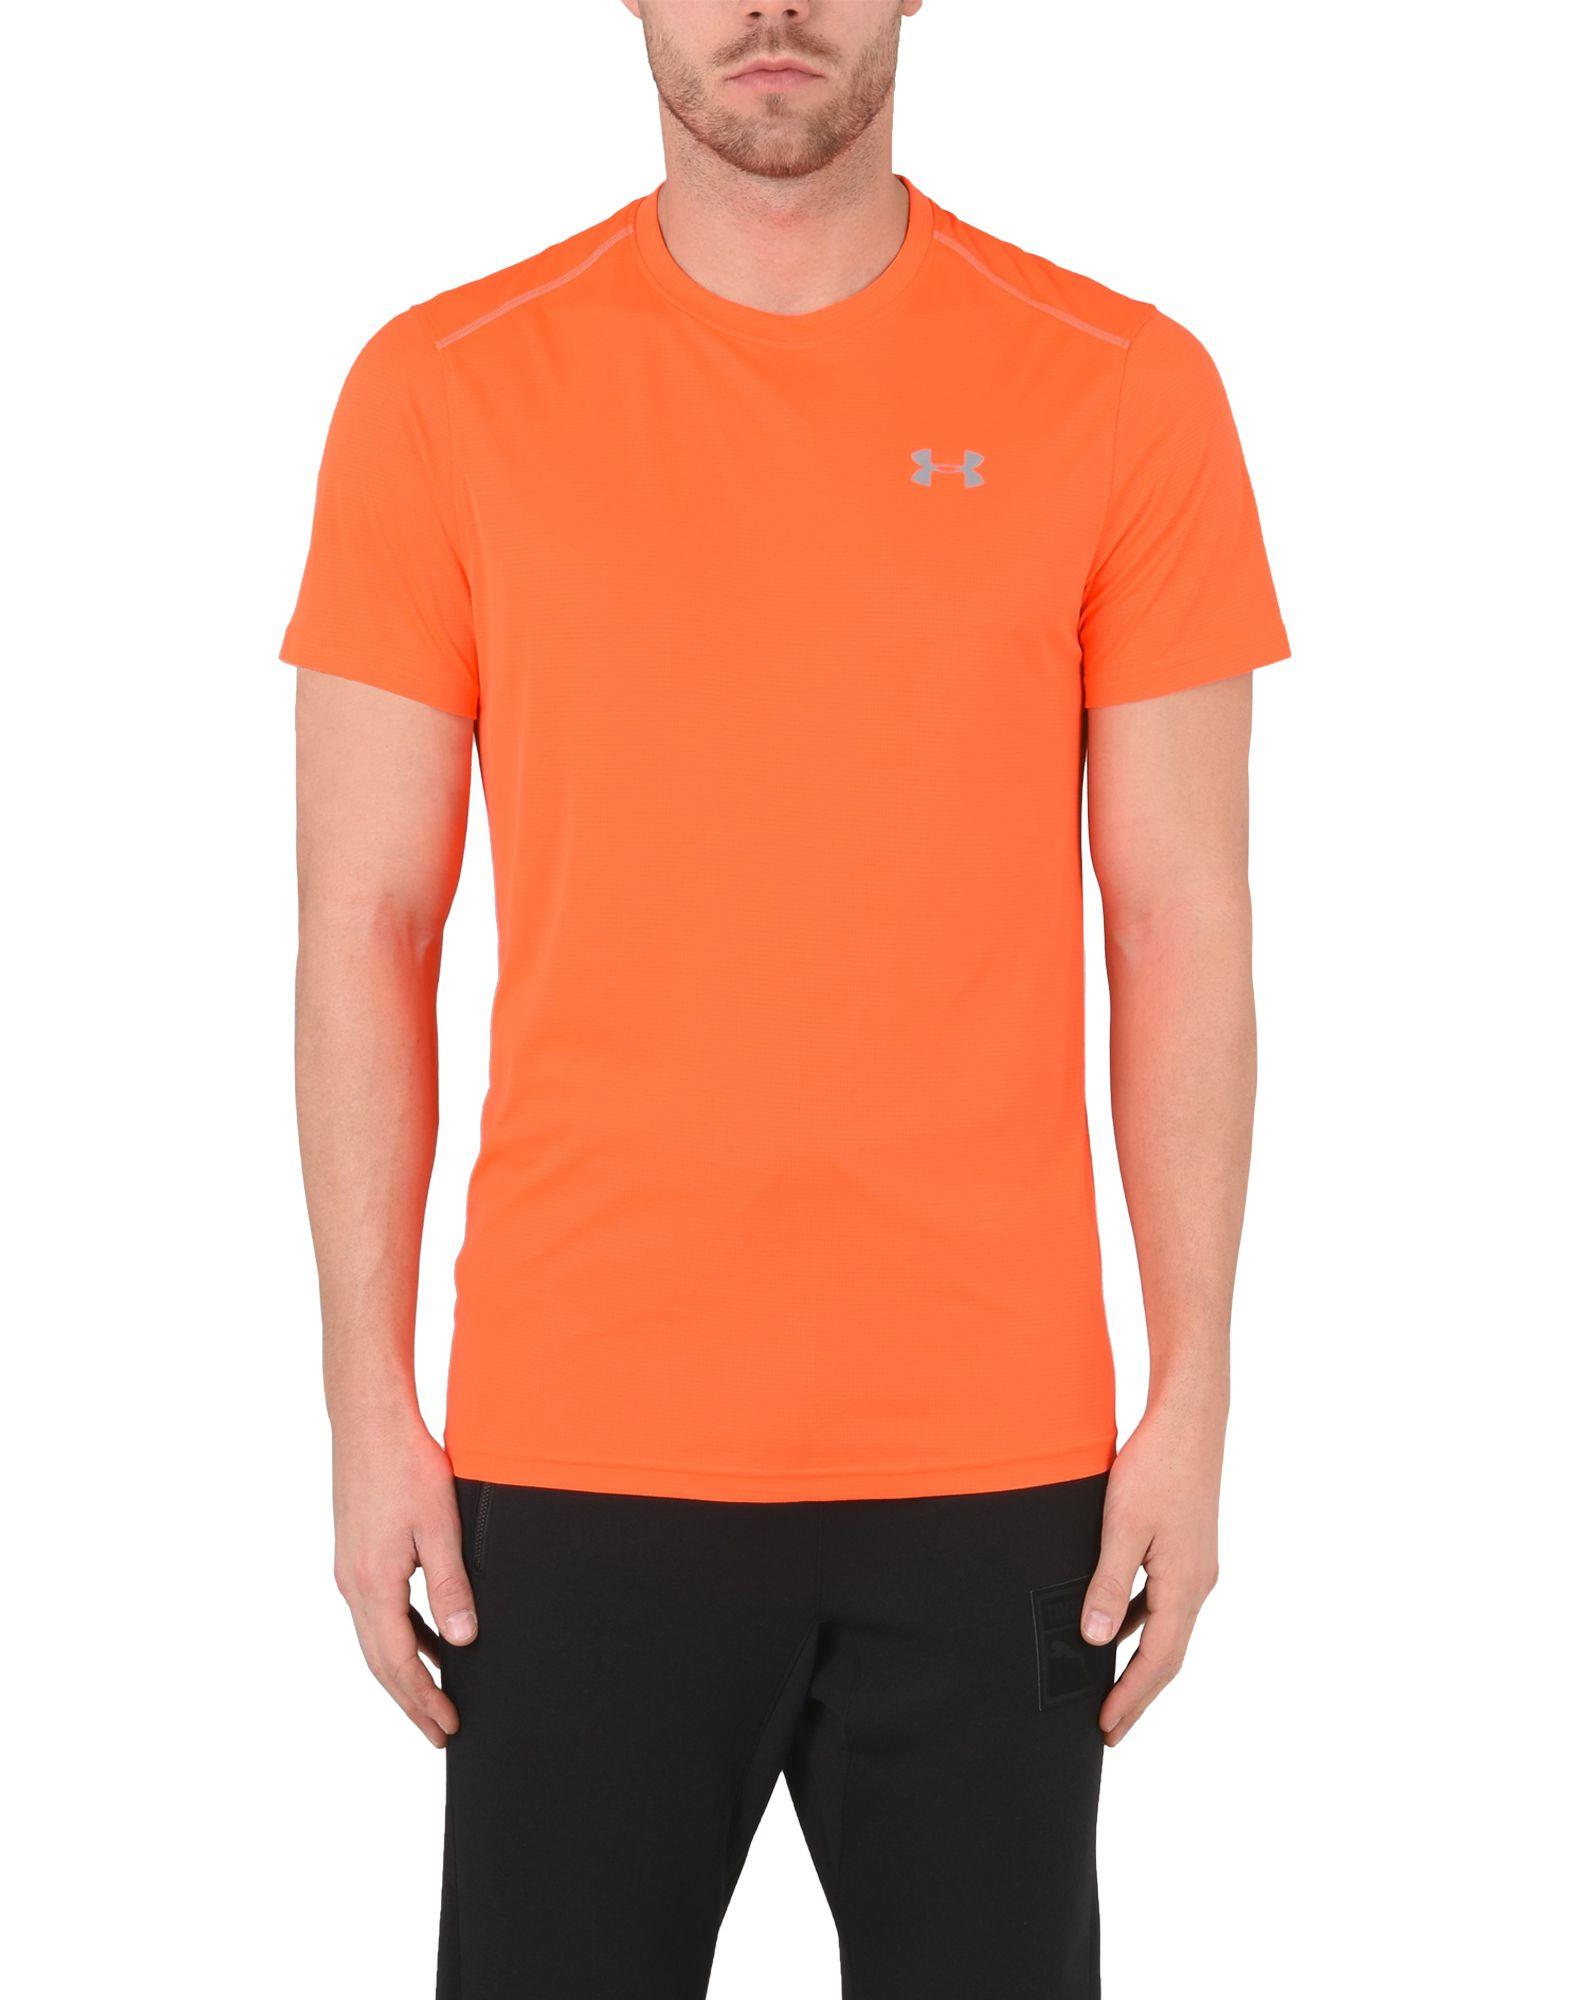 Color camiseta foto carnet 35